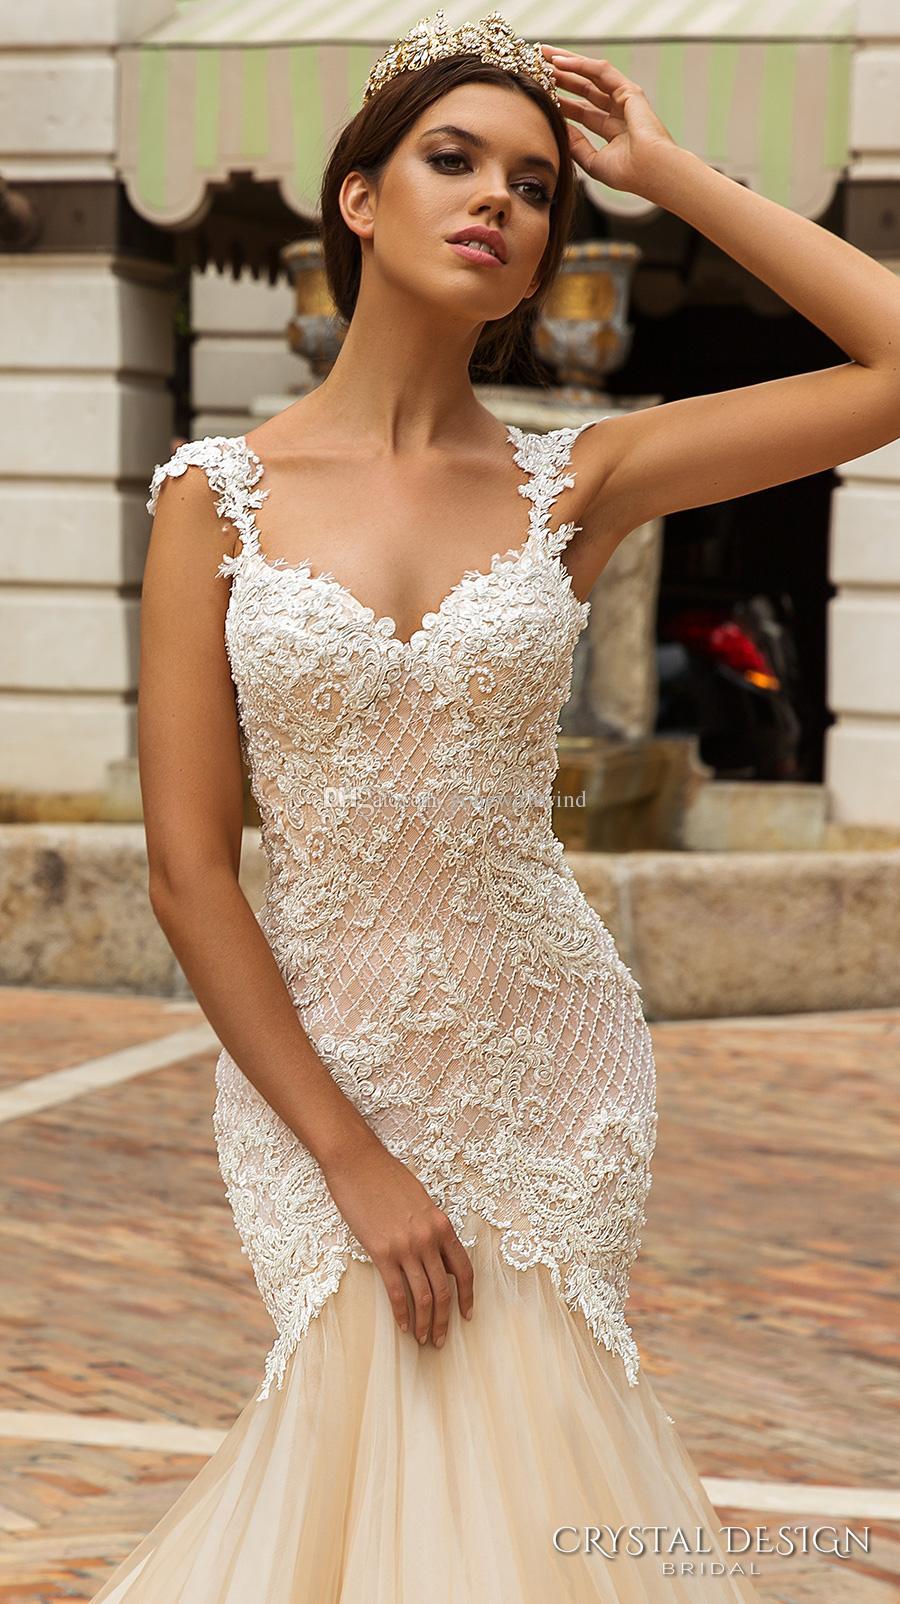 Crystal Embellished Mermaid Tulle Skirt Wedding Dress